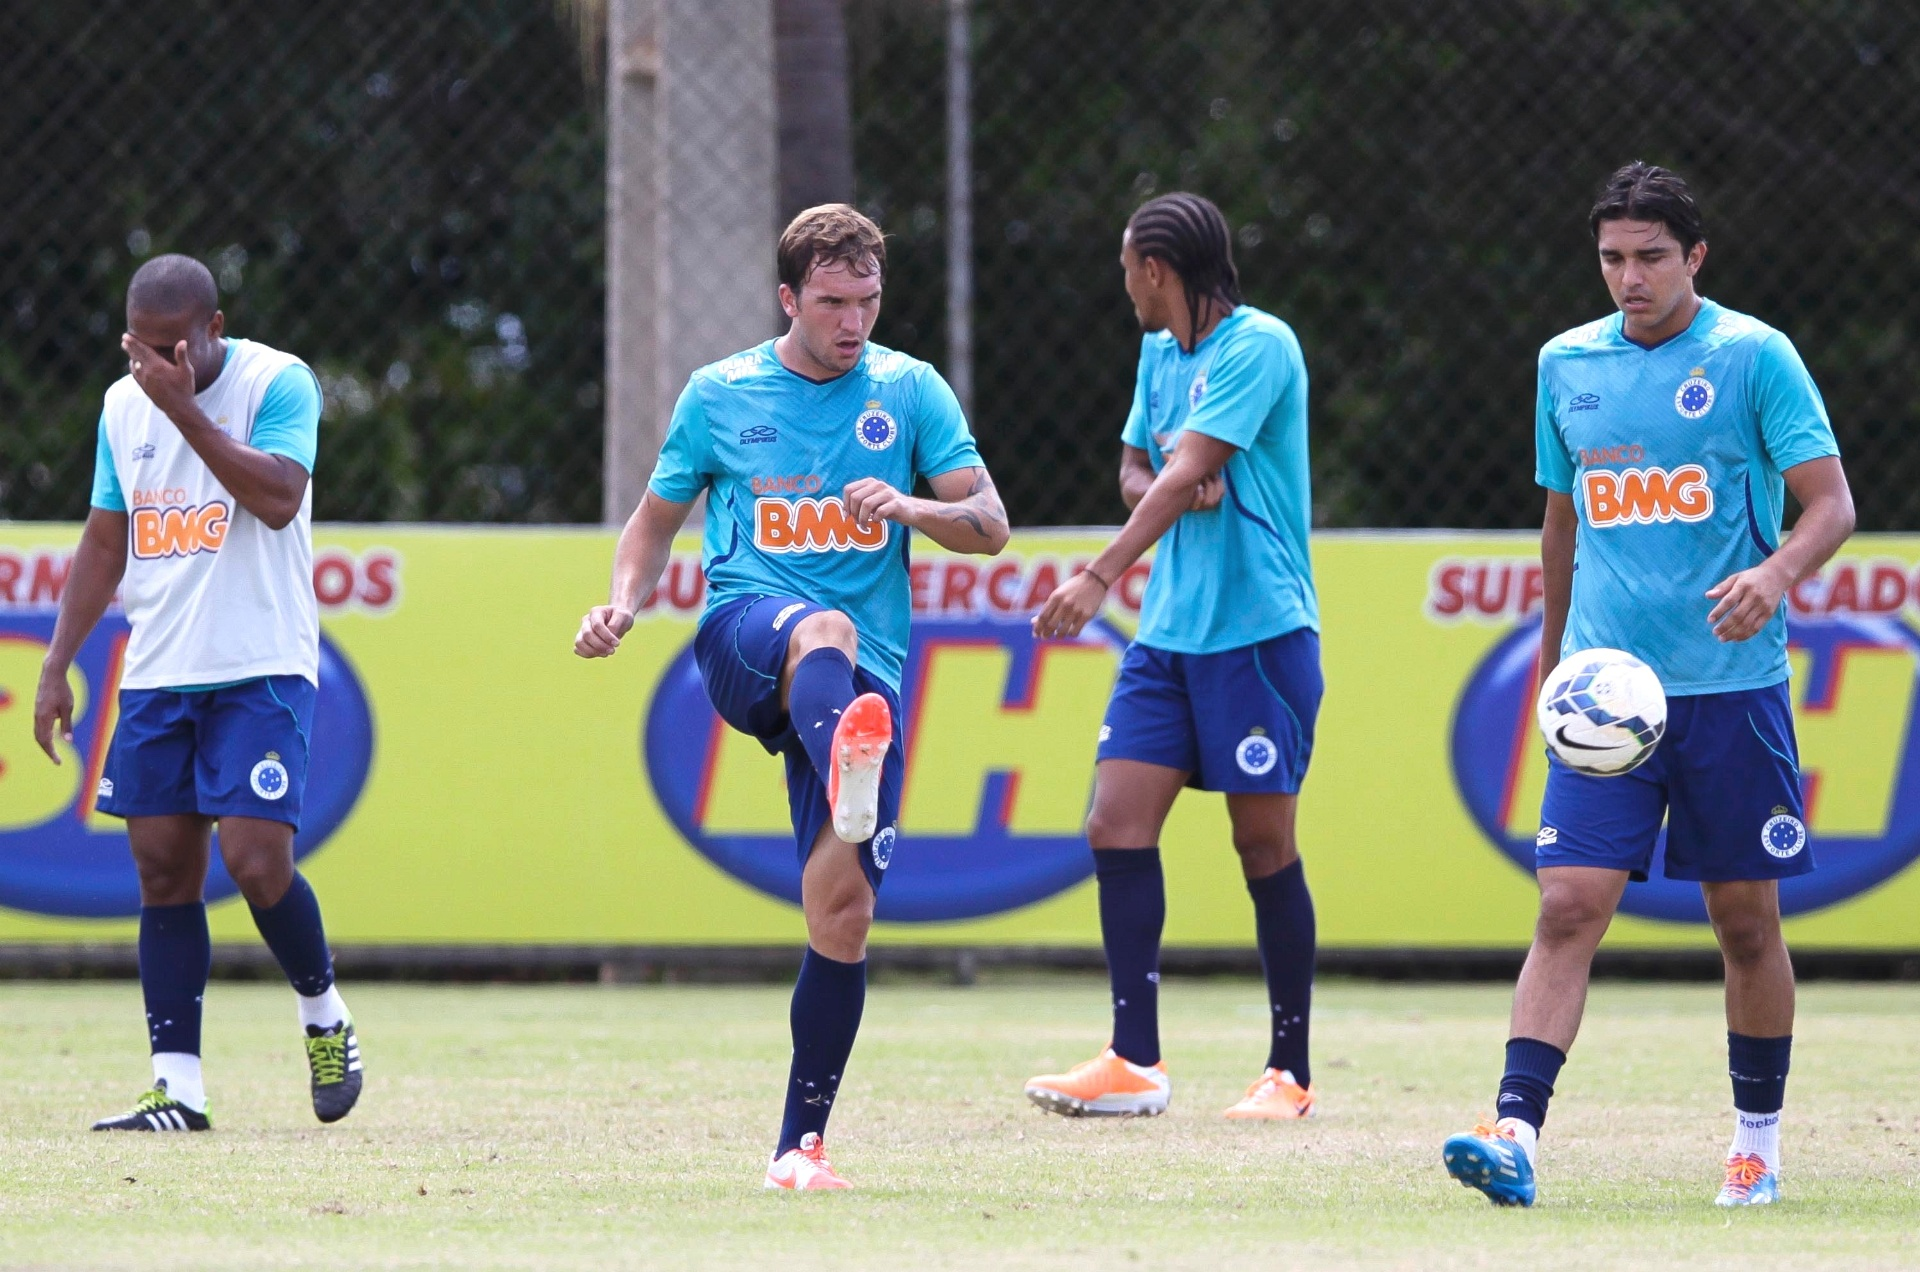 Willian Farias aproveita chance e esquenta disputa no Cruzeiro - Esporte -  BOL 8f6a4f654a516